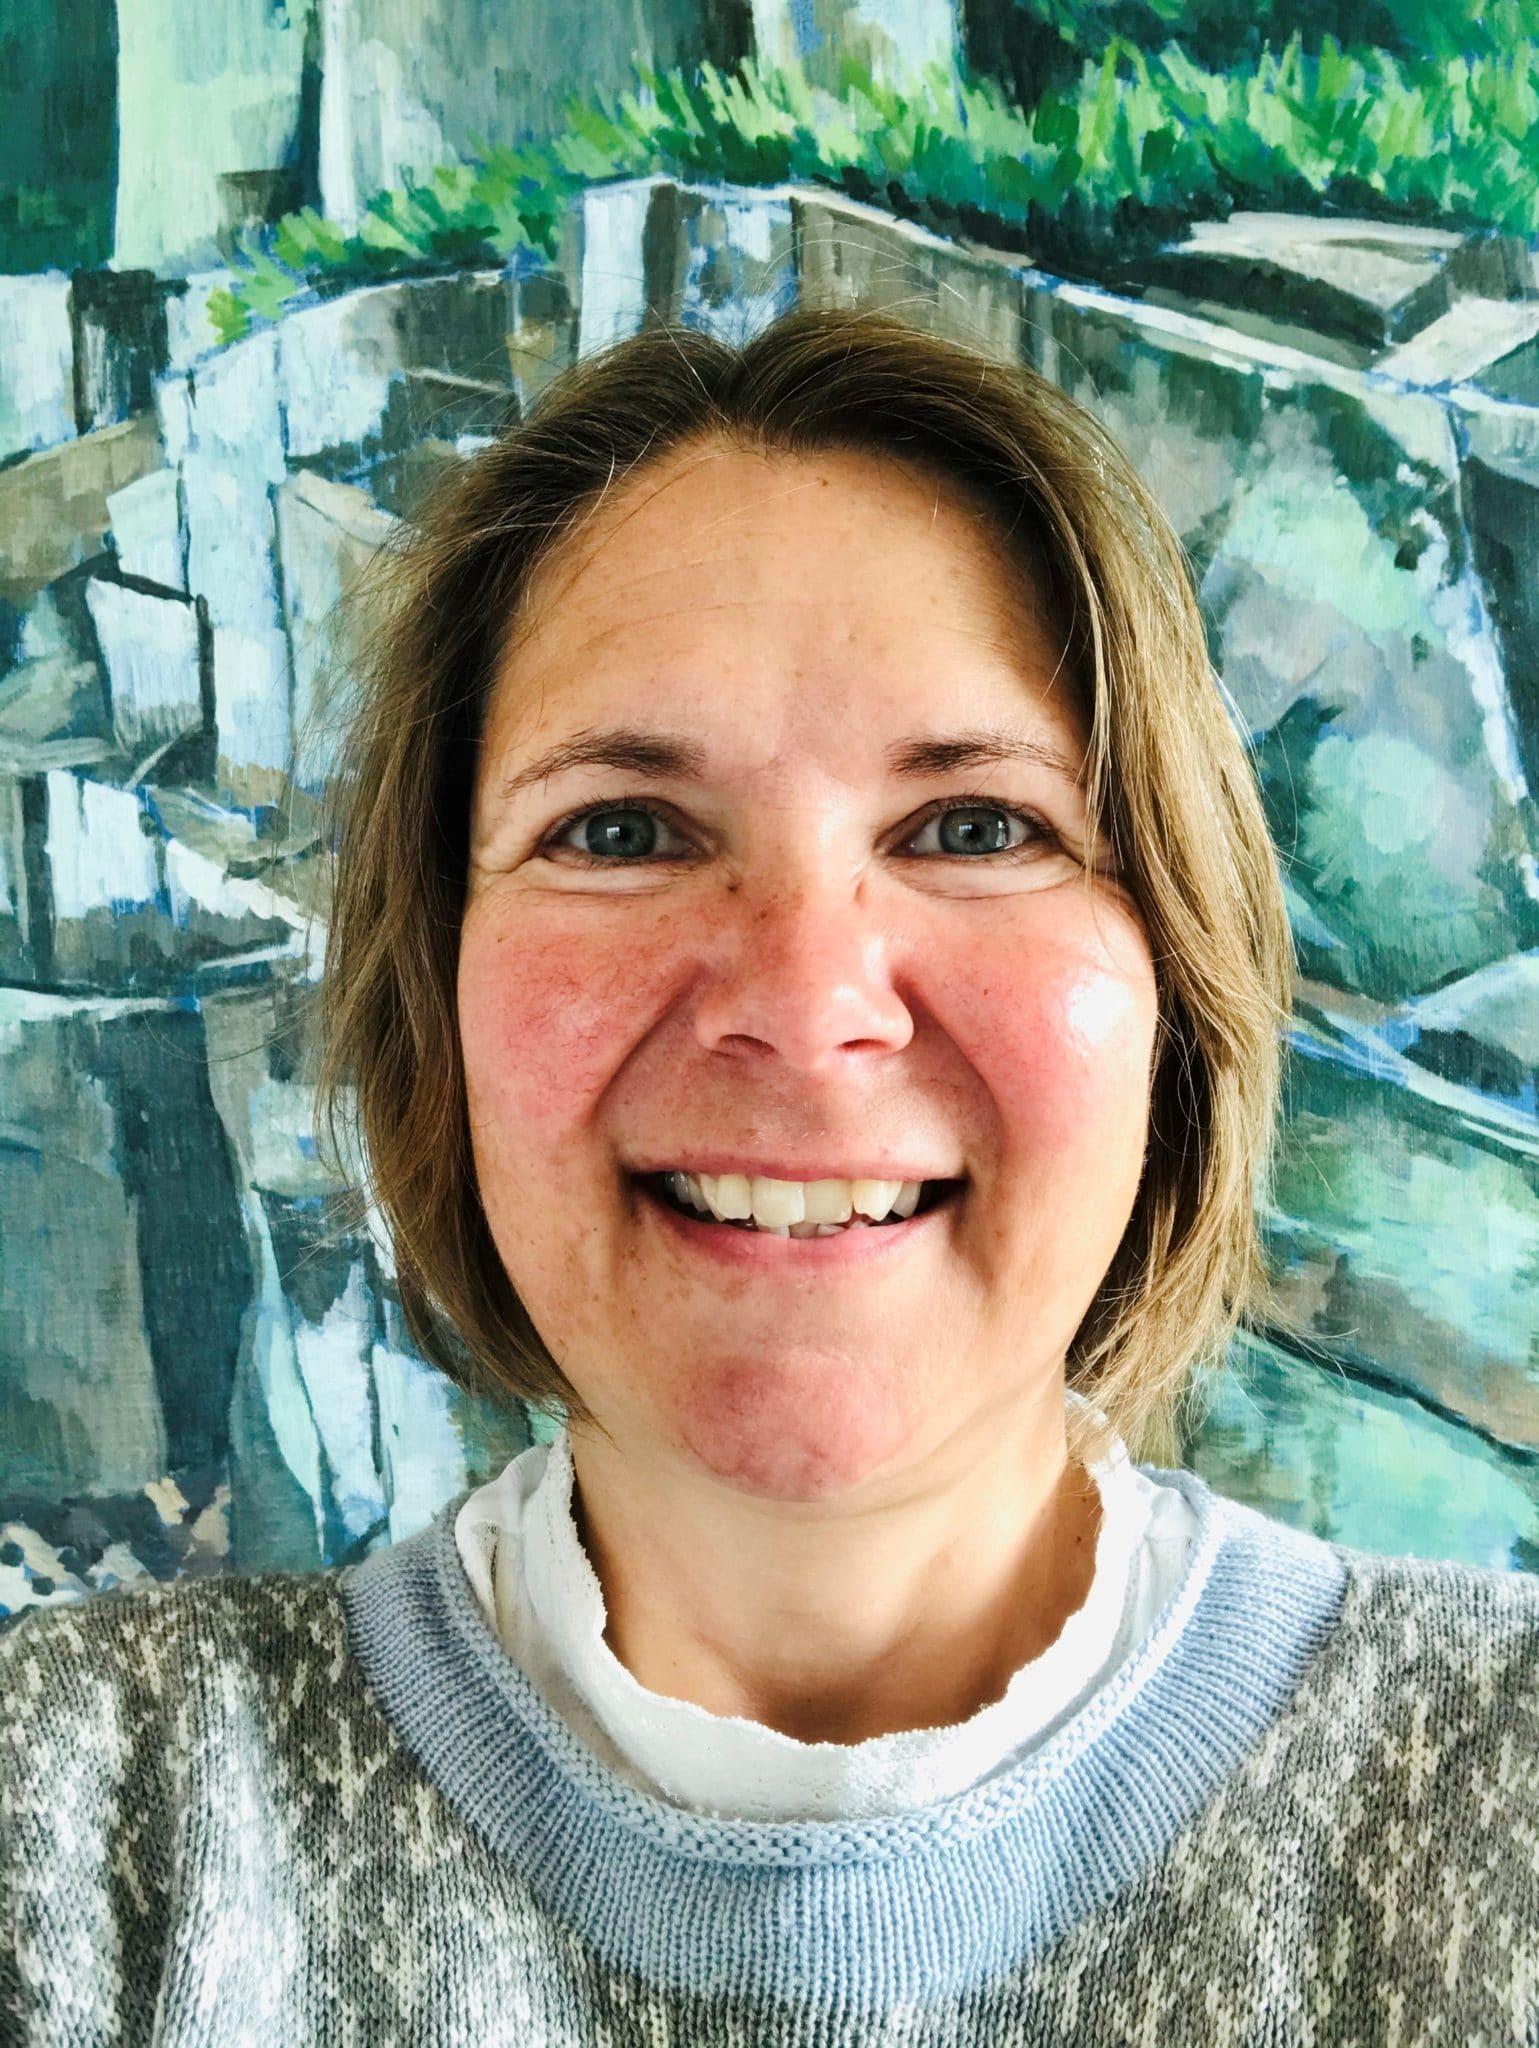 Gallerist Christine Stampe Frøsig